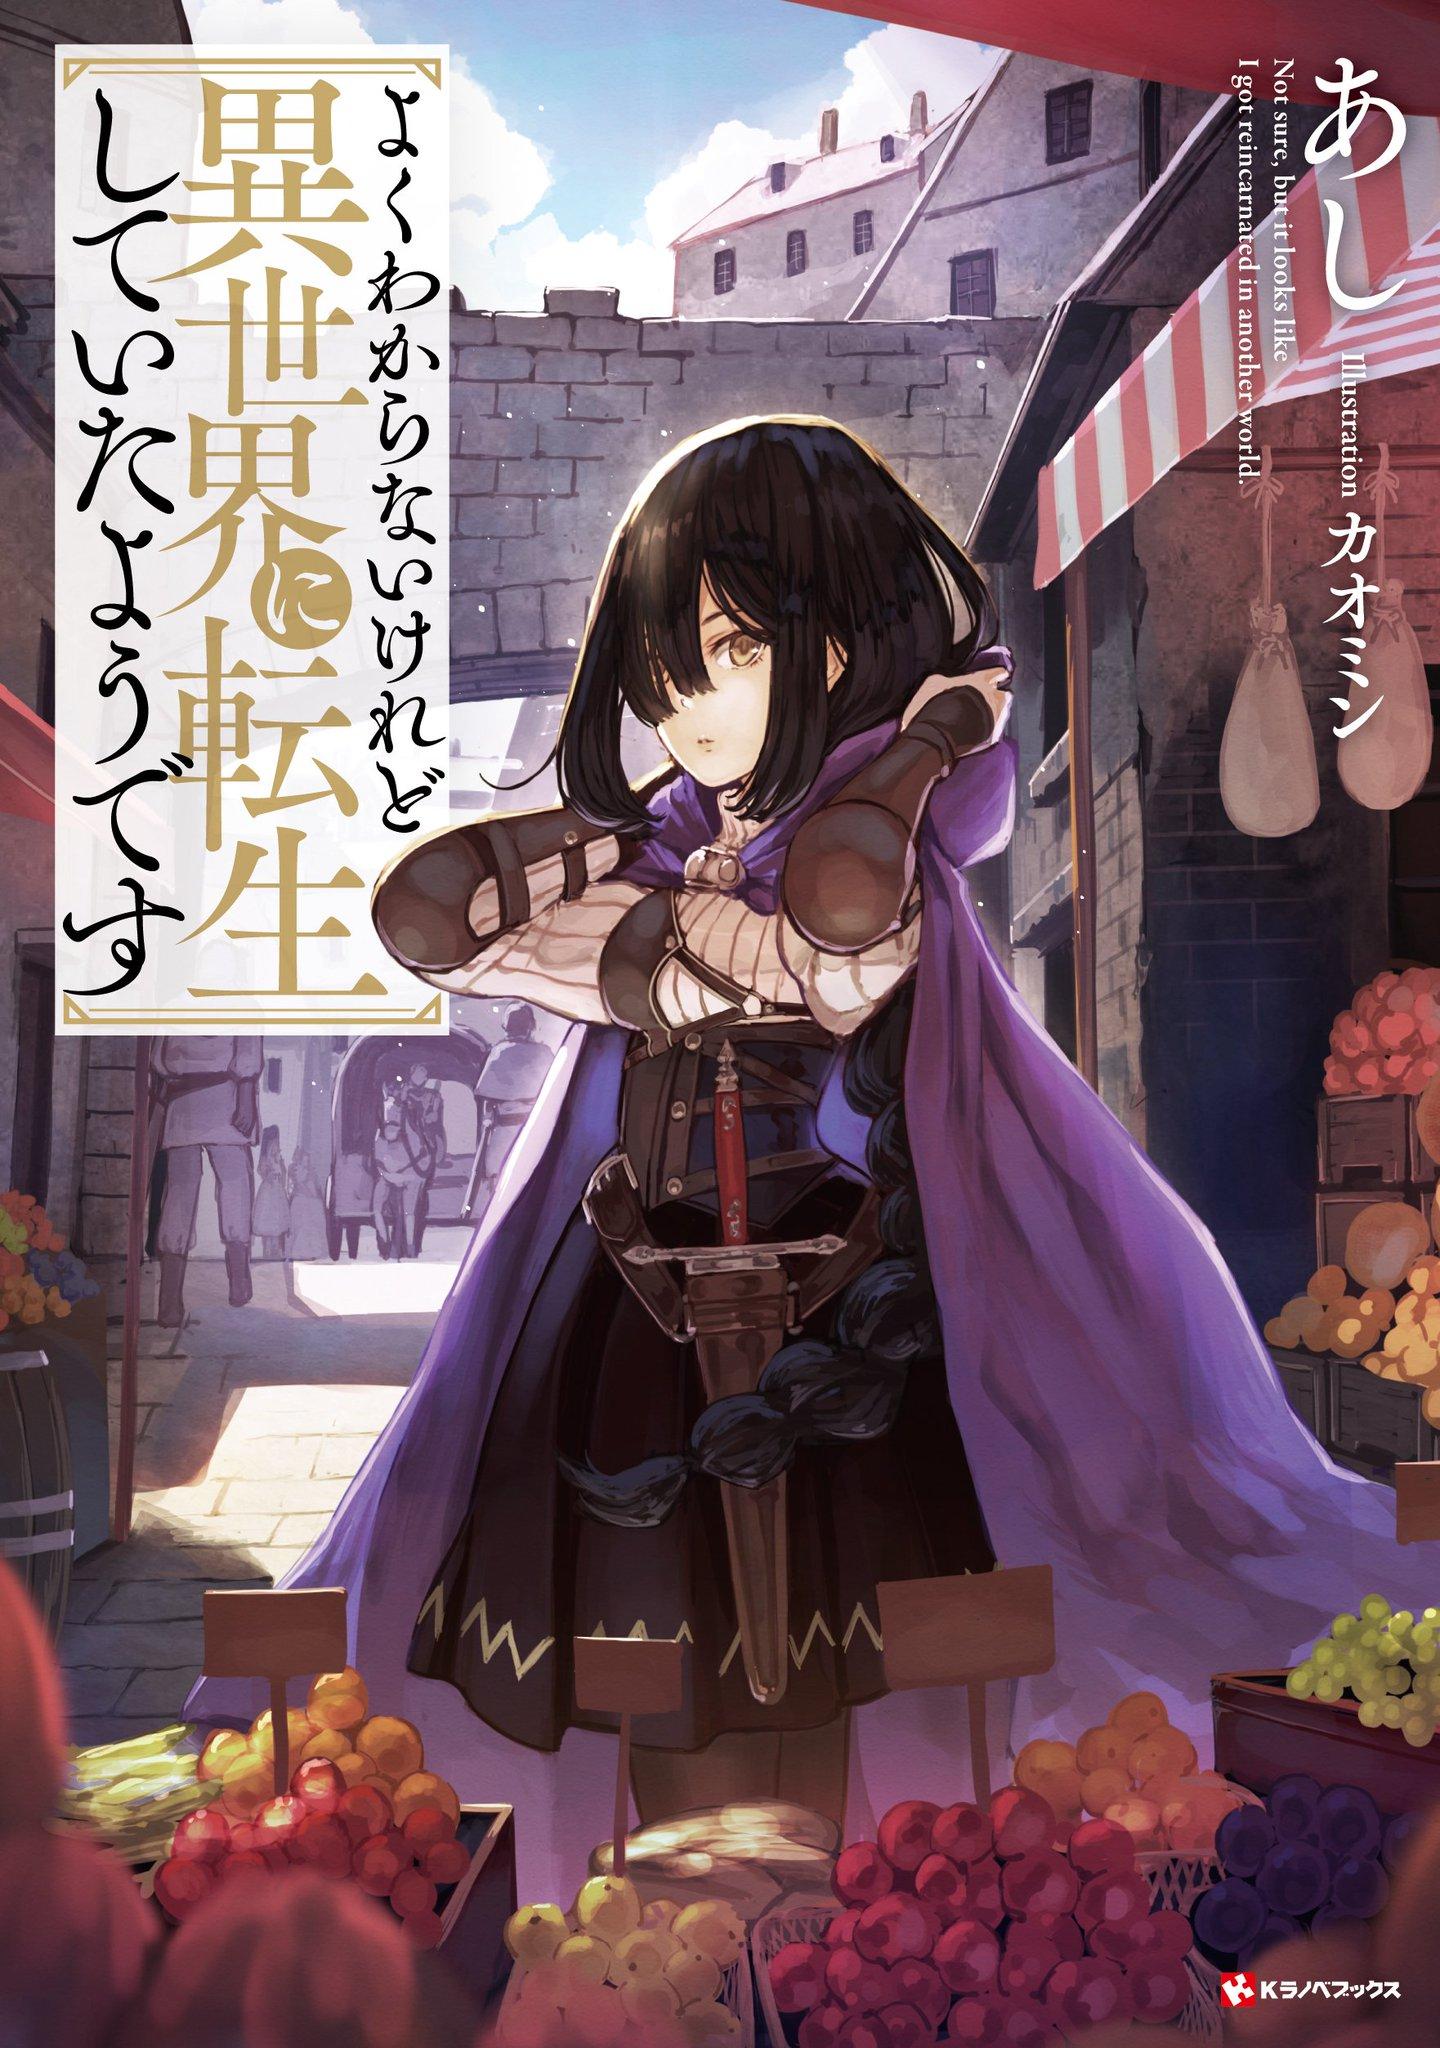 J-Novel Club Forums | Least Informative Titles in Novels